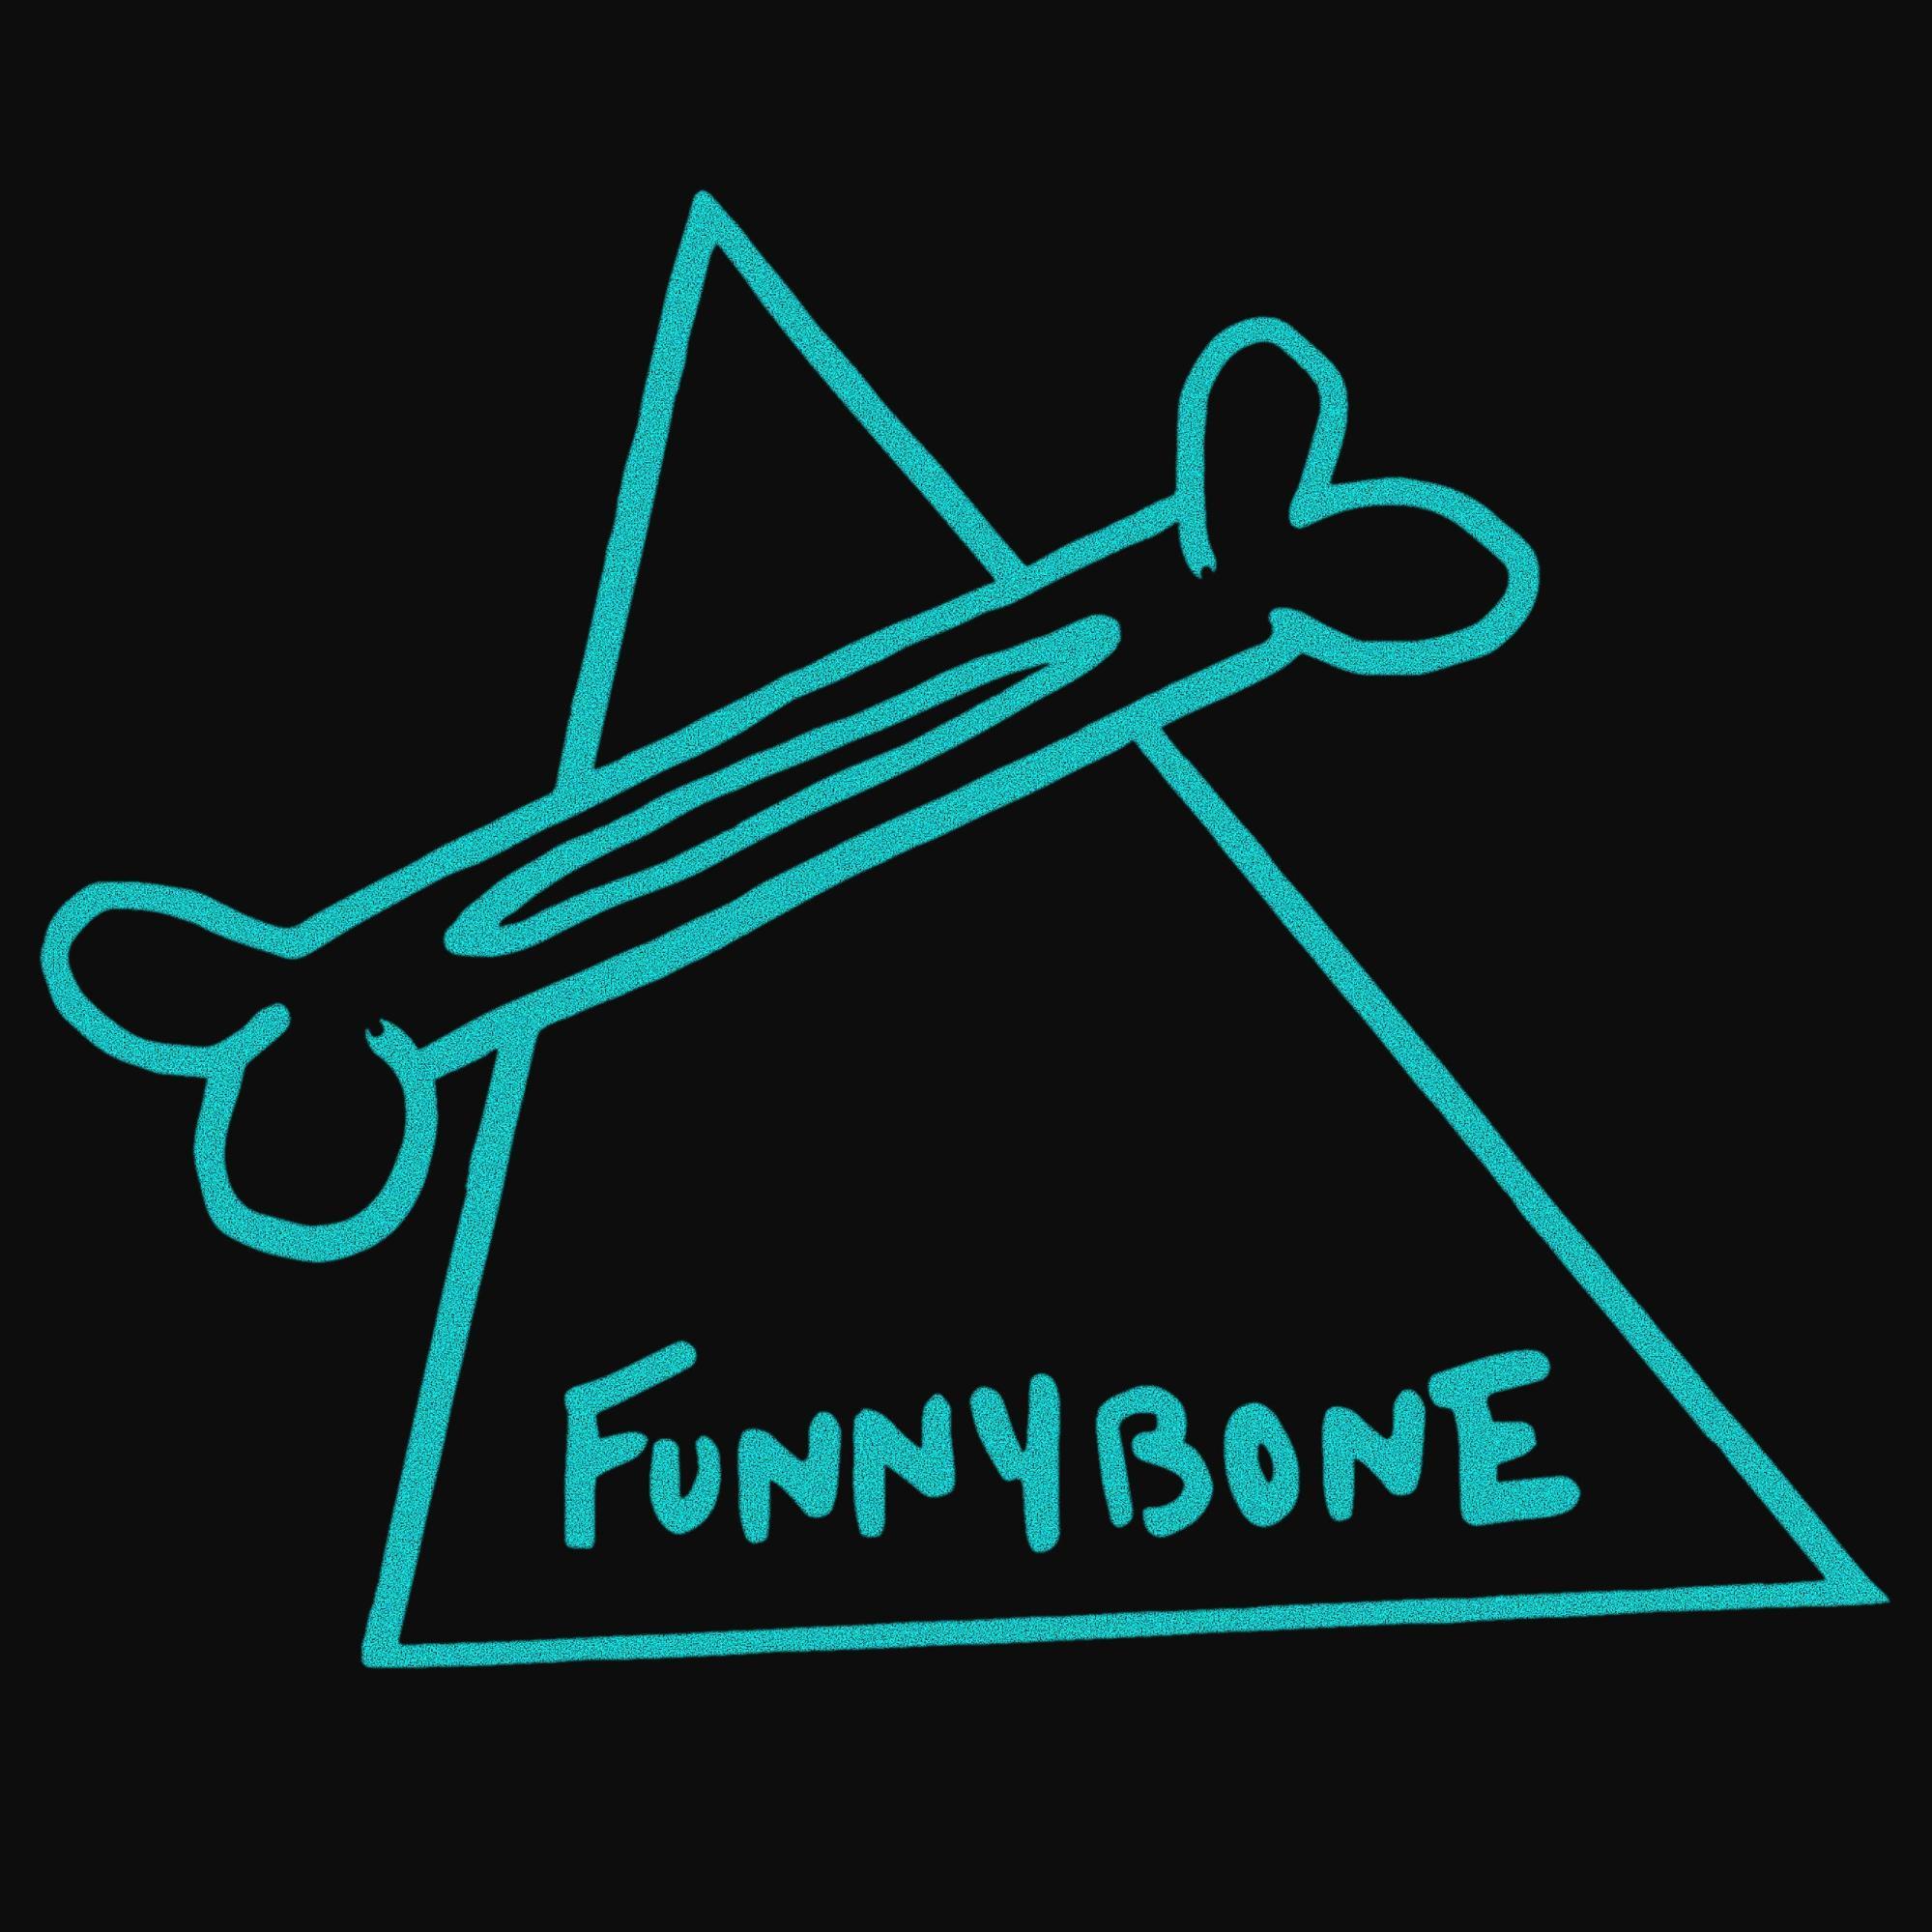 funnybone logo 3